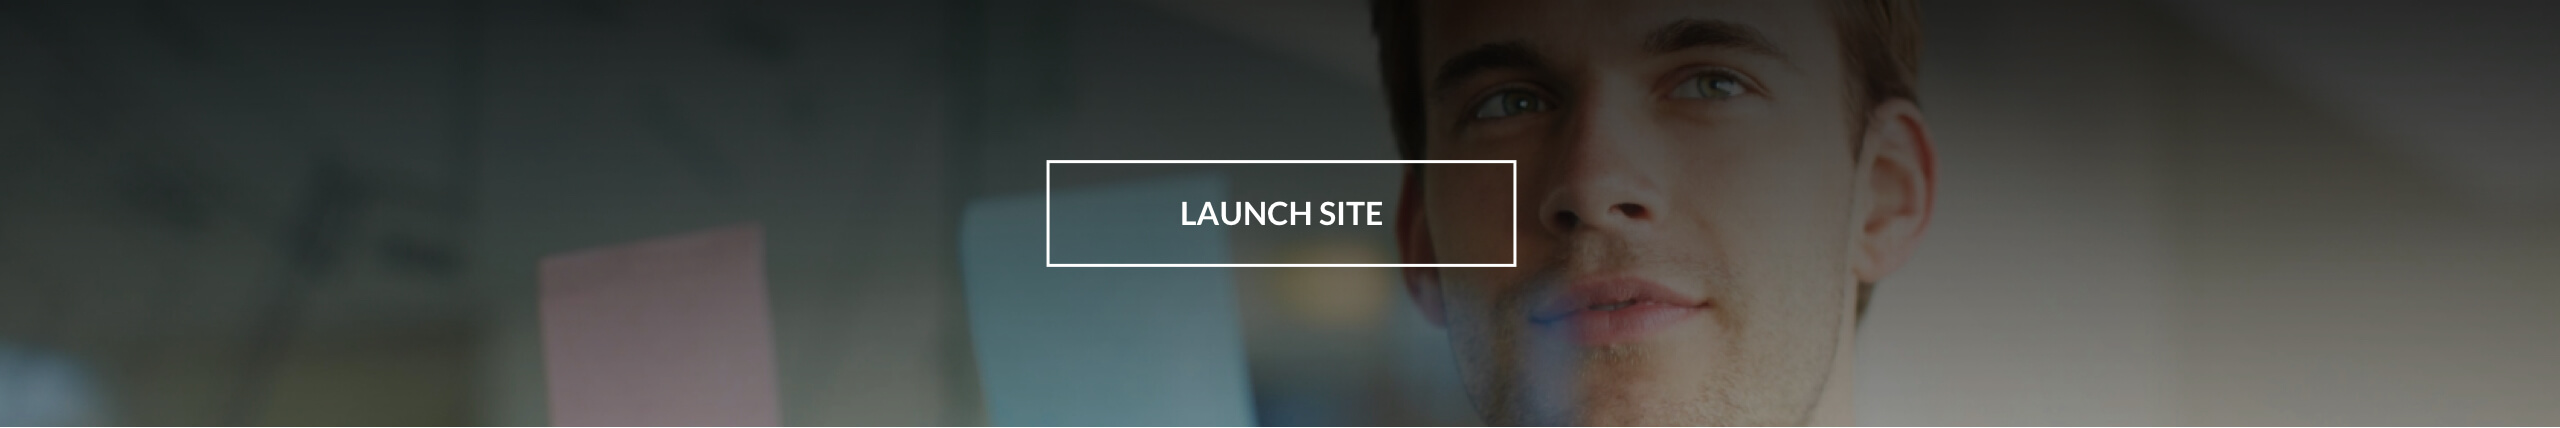 launch_site